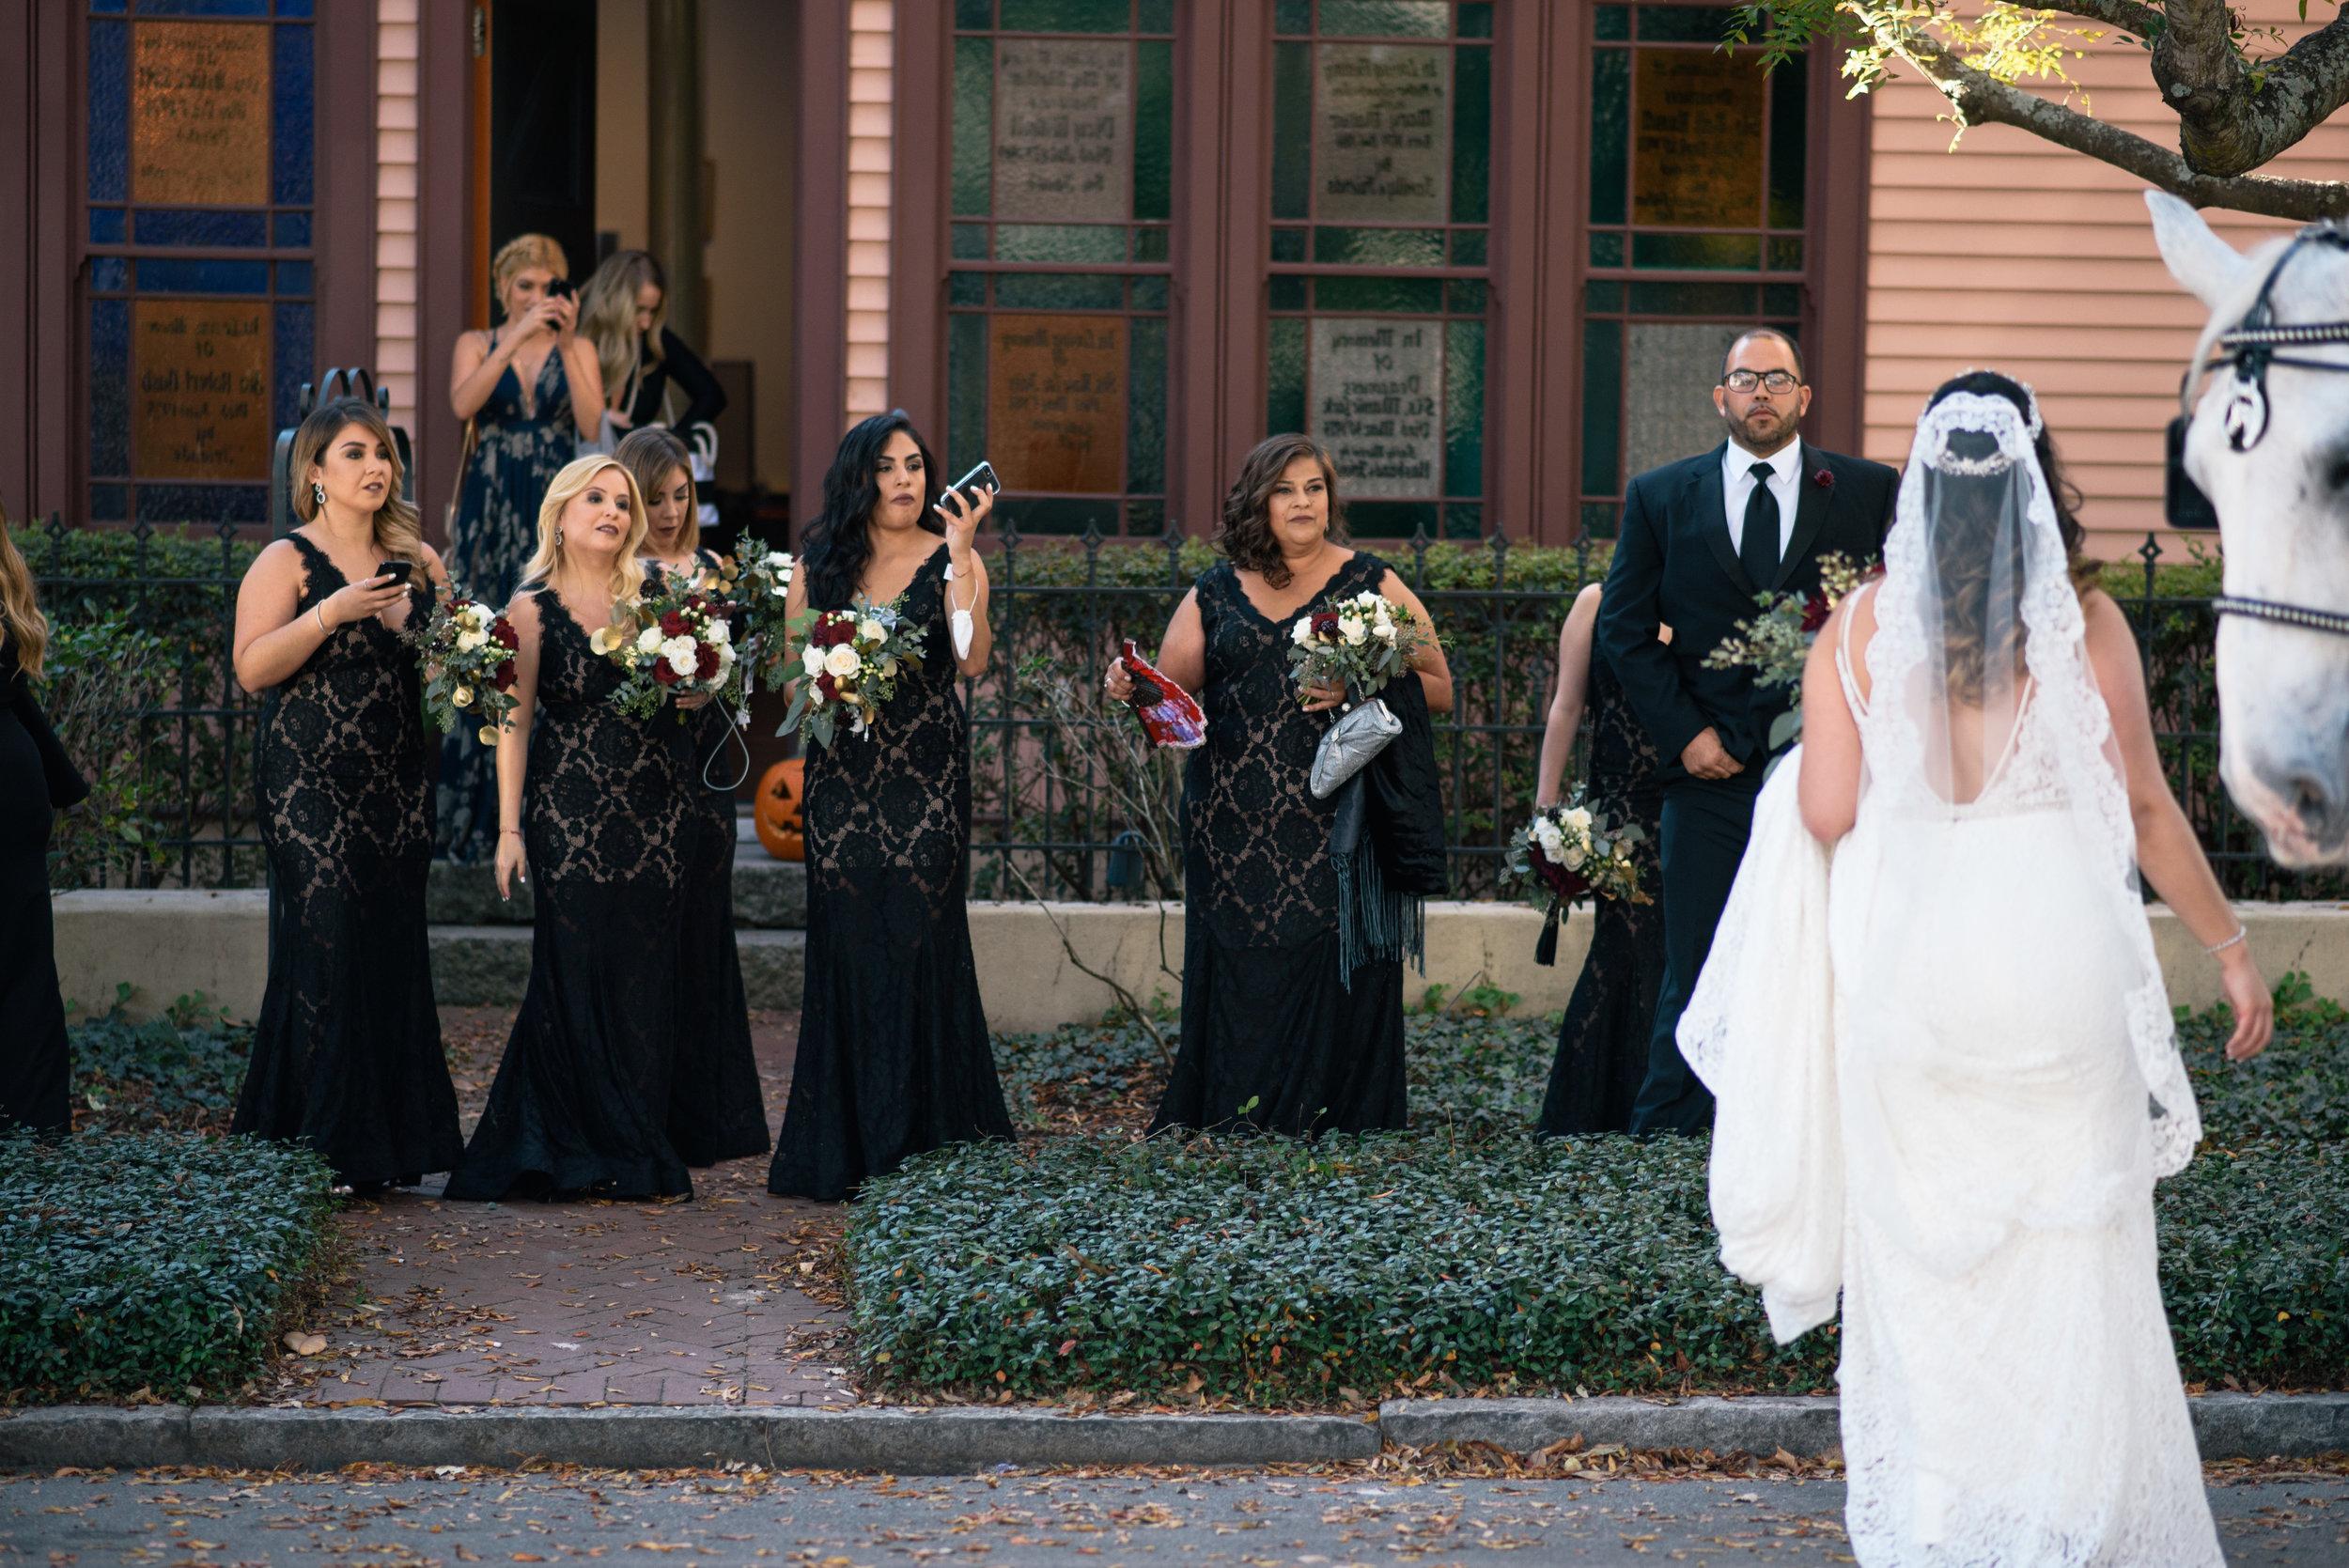 Iggy-and-yesenia-savannah-railroad-museum-wedding-meg-hill-photo- (307 of 1037).jpg